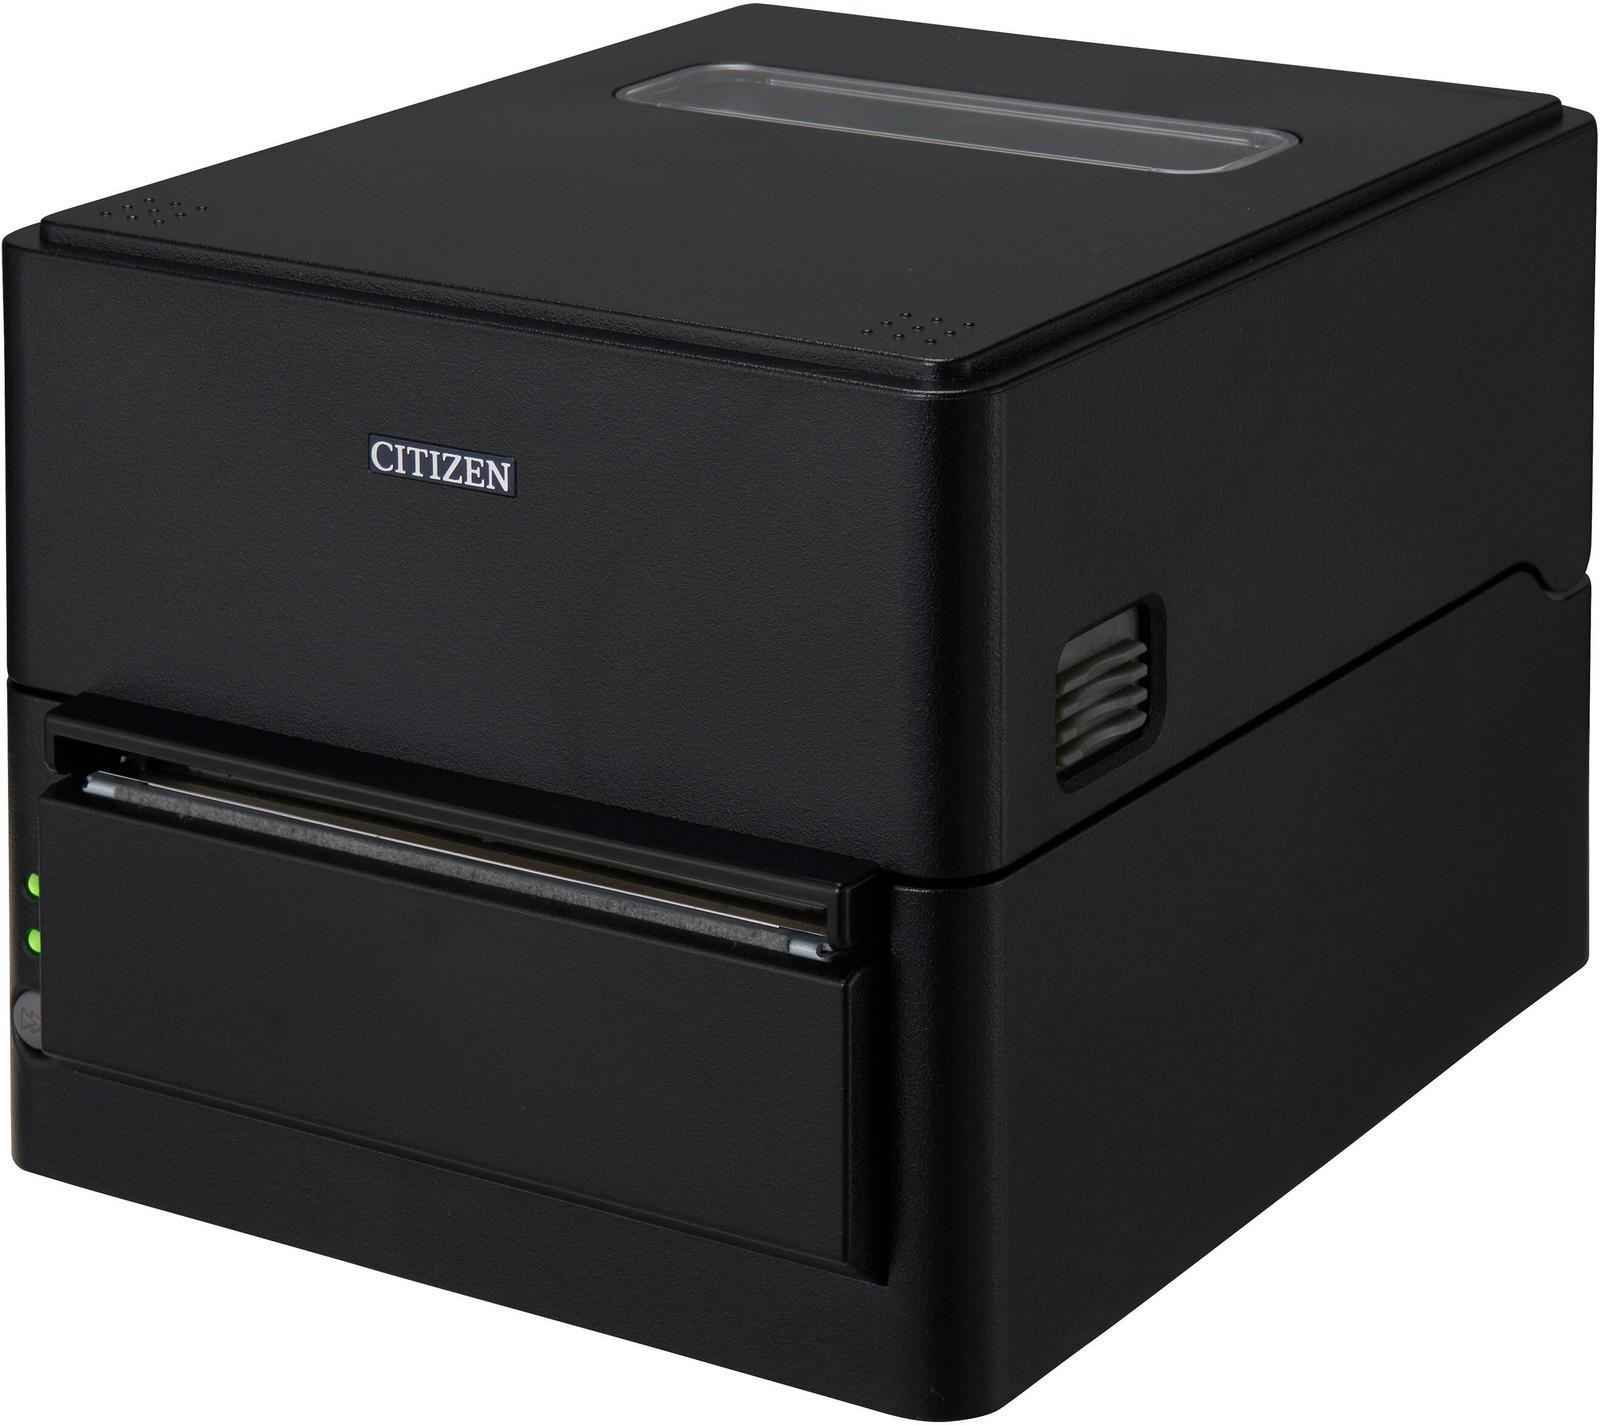 CITIZEN CT-S4500 PRINTER USB,